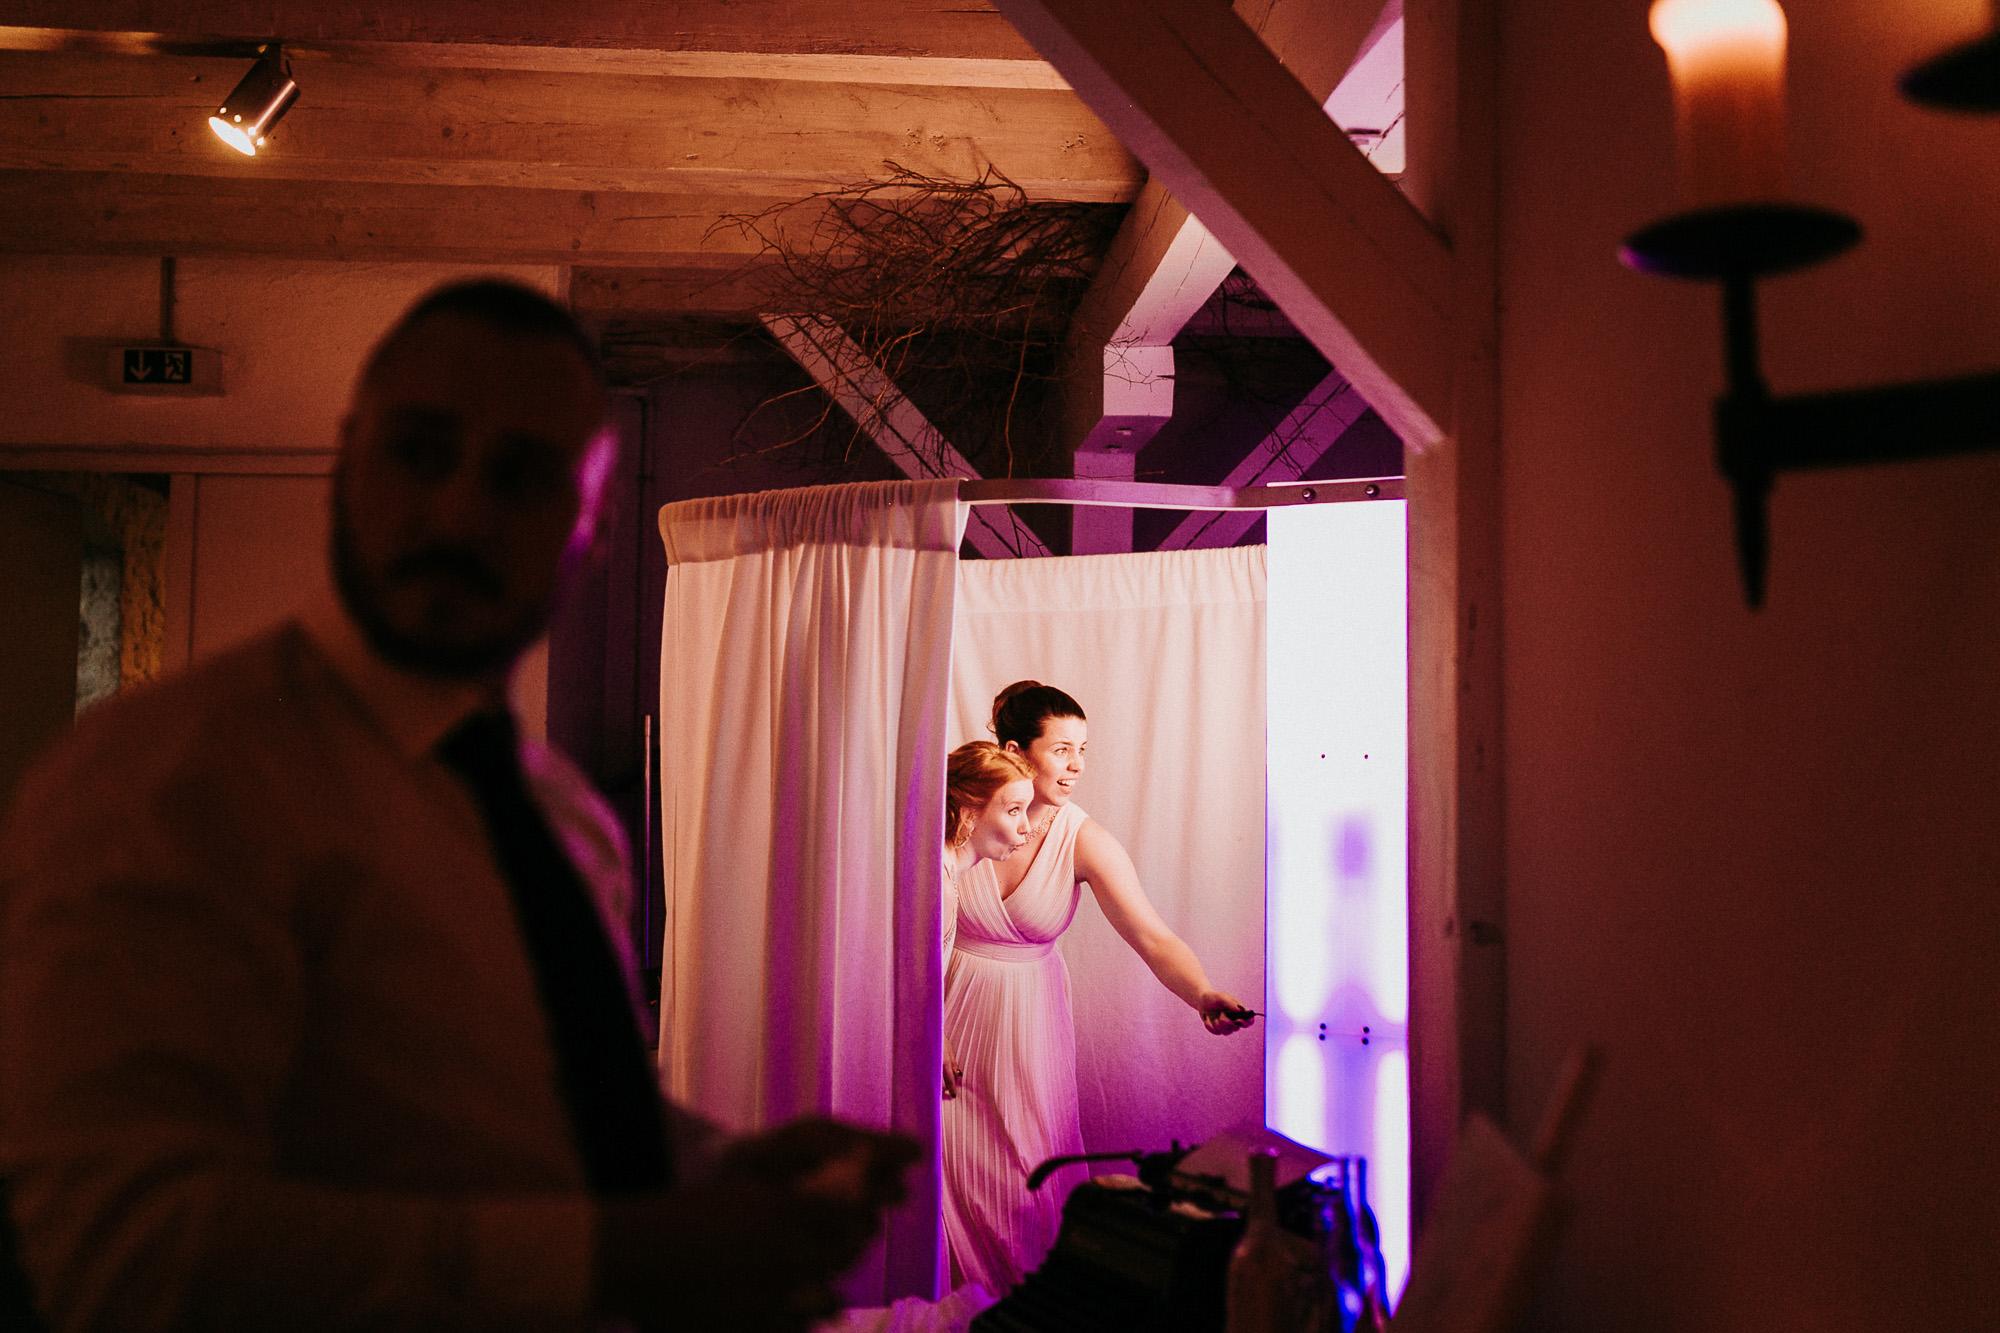 DanielaMarquardtPhotography_Hochzeitsfotograf_Düsseldorf_Köln_Mallorca_Bayern_Austria_Harz_Wedding_AileenundLennart_Weddingphotographer_Ibiza_Tuskany_Italien_Toskana_Portugal_Lissabon256